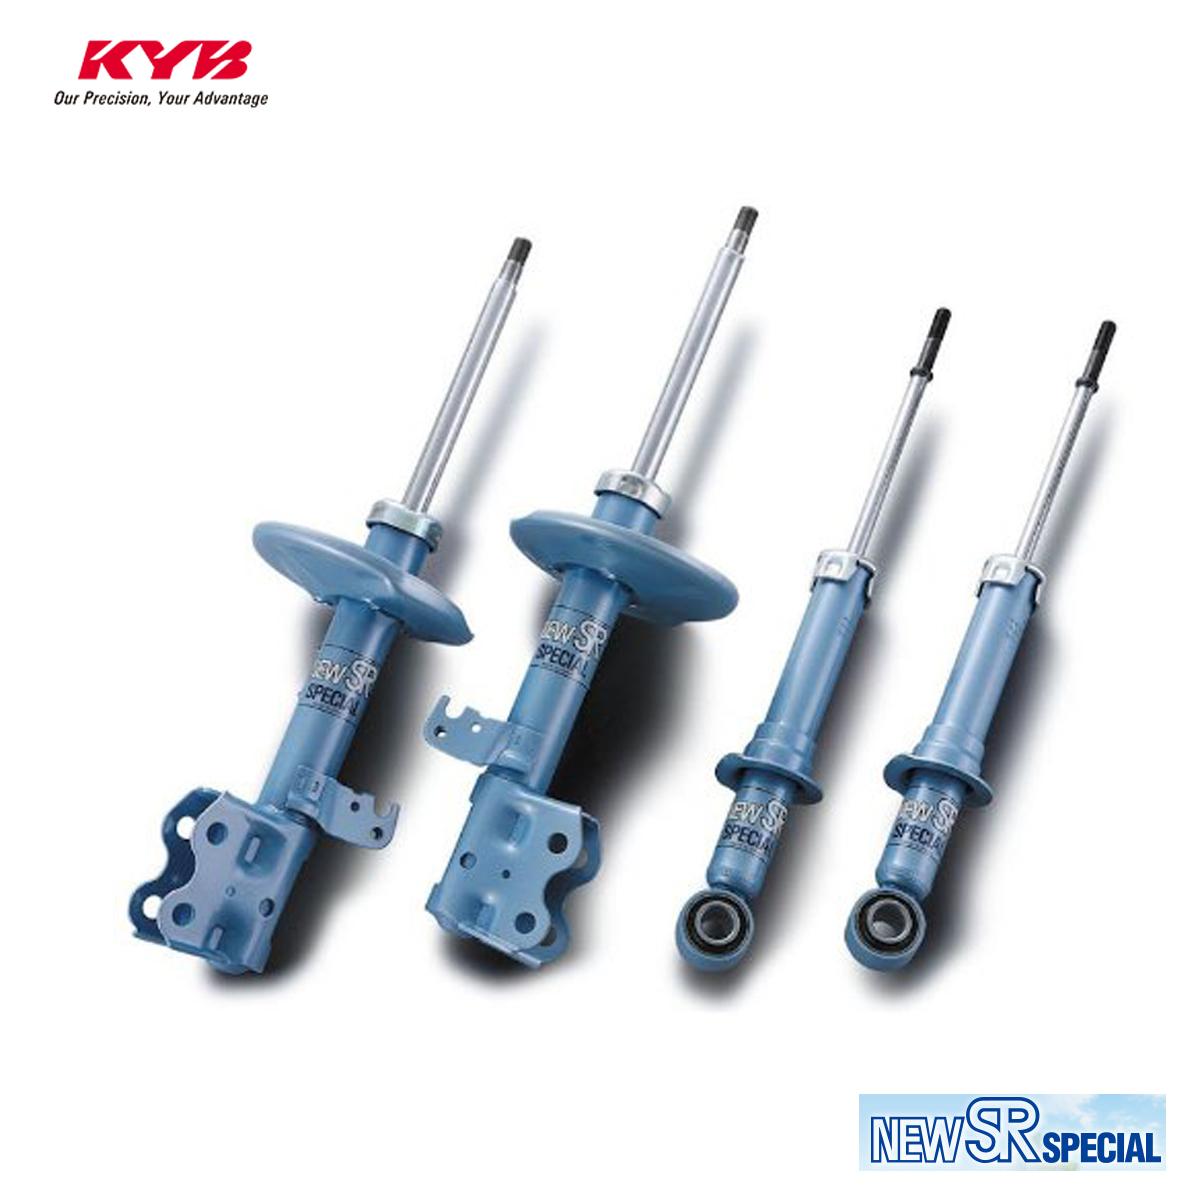 KYB カヤバ セレナ KVJC23 ショックアブソーバー フロント 右用 1本 NEW SR SPECIAL NST5117R 配送先条件有り